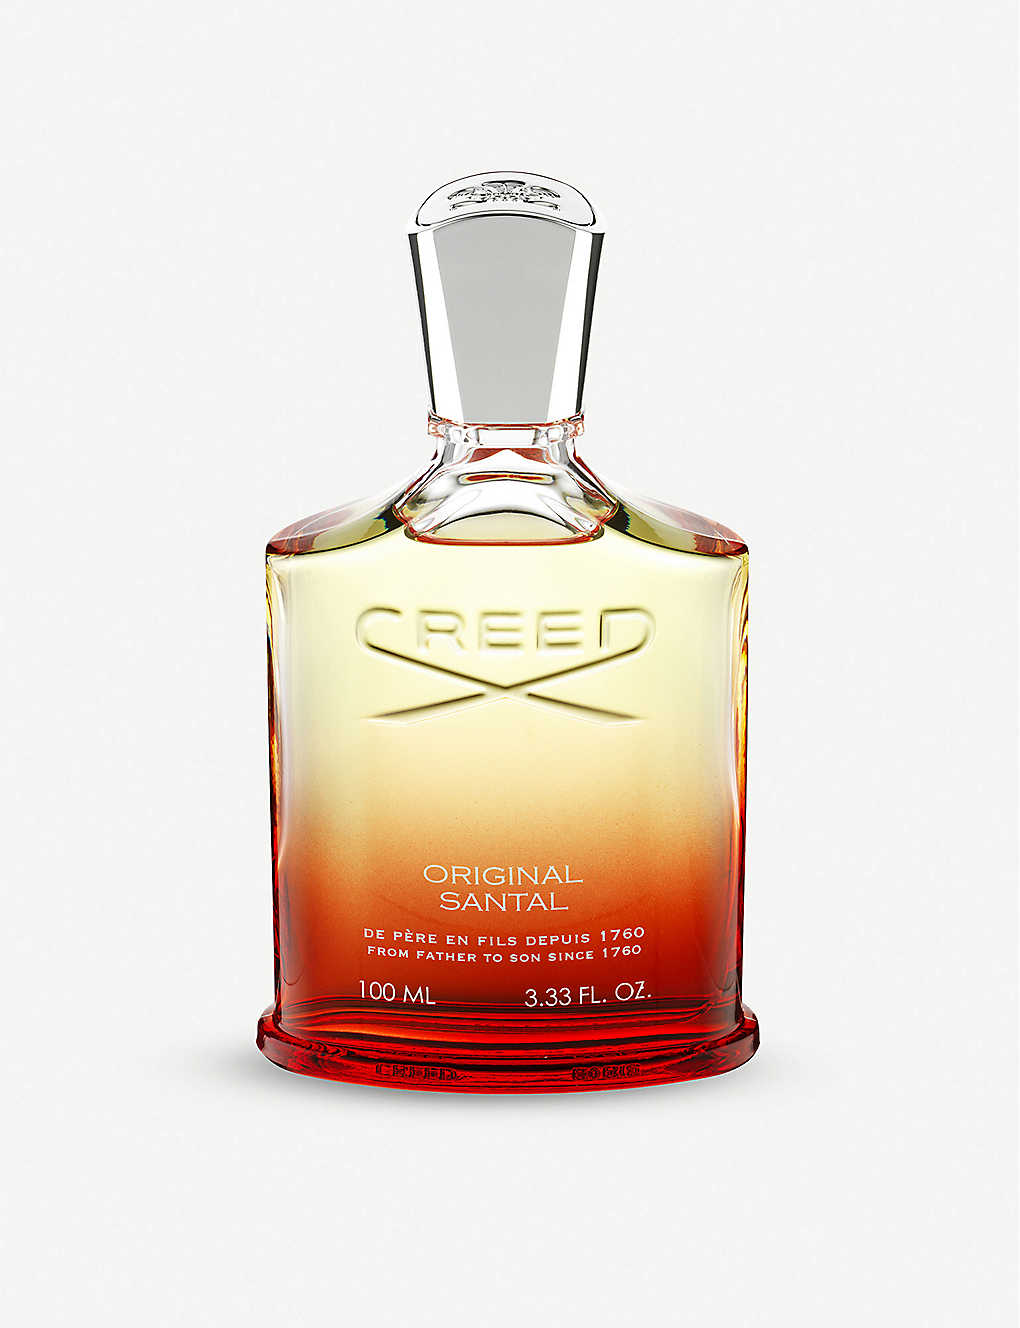 Creed Womens Perfume Fragrance Beauty Selfridges Shop Online